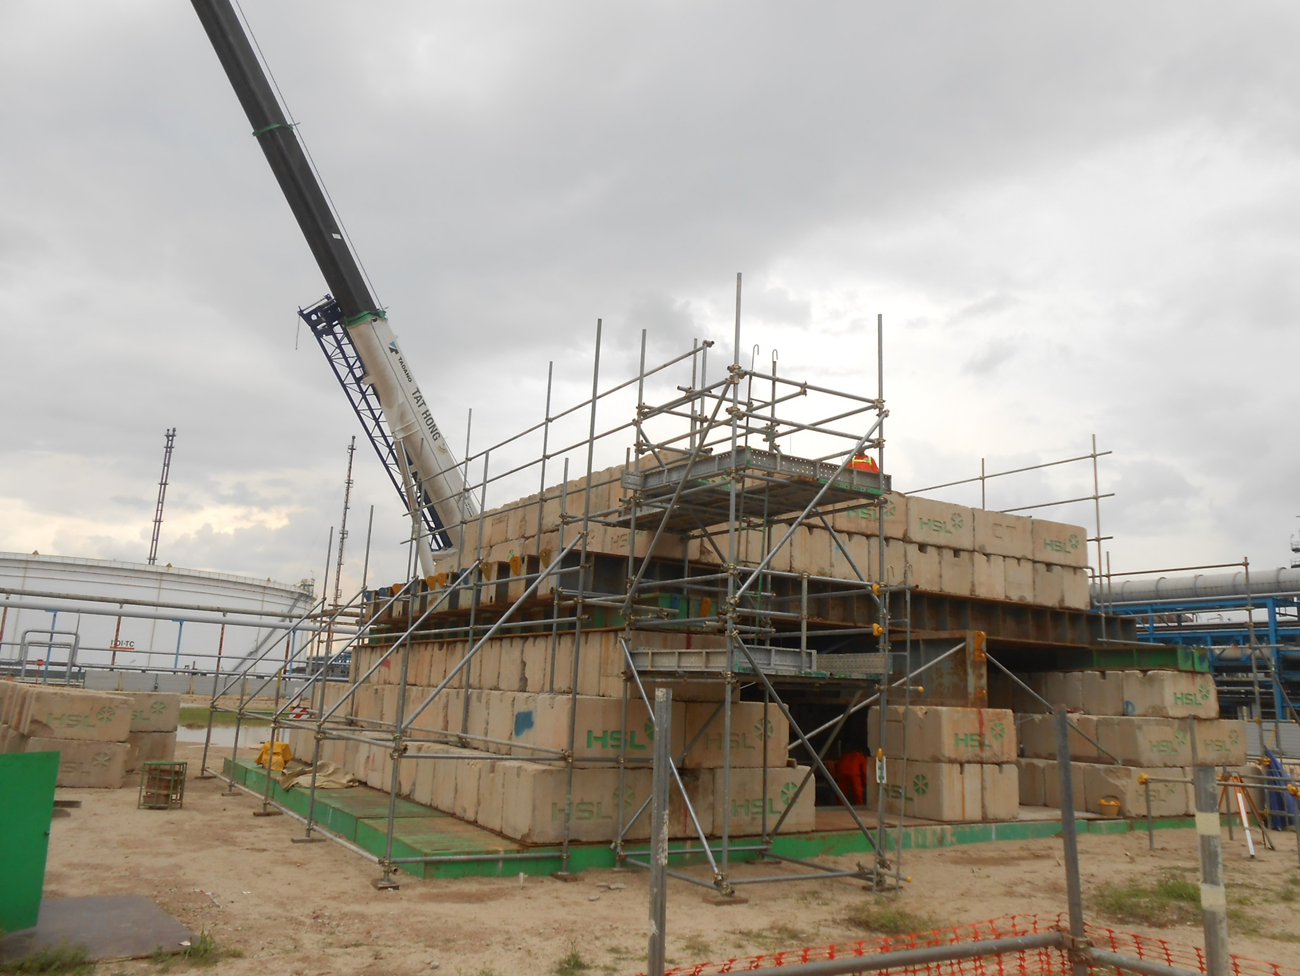 2015 SRC Cogen Mogas Project Test Pile Work ( Kentledge setting up) / Test Pile Work ( PDA test)